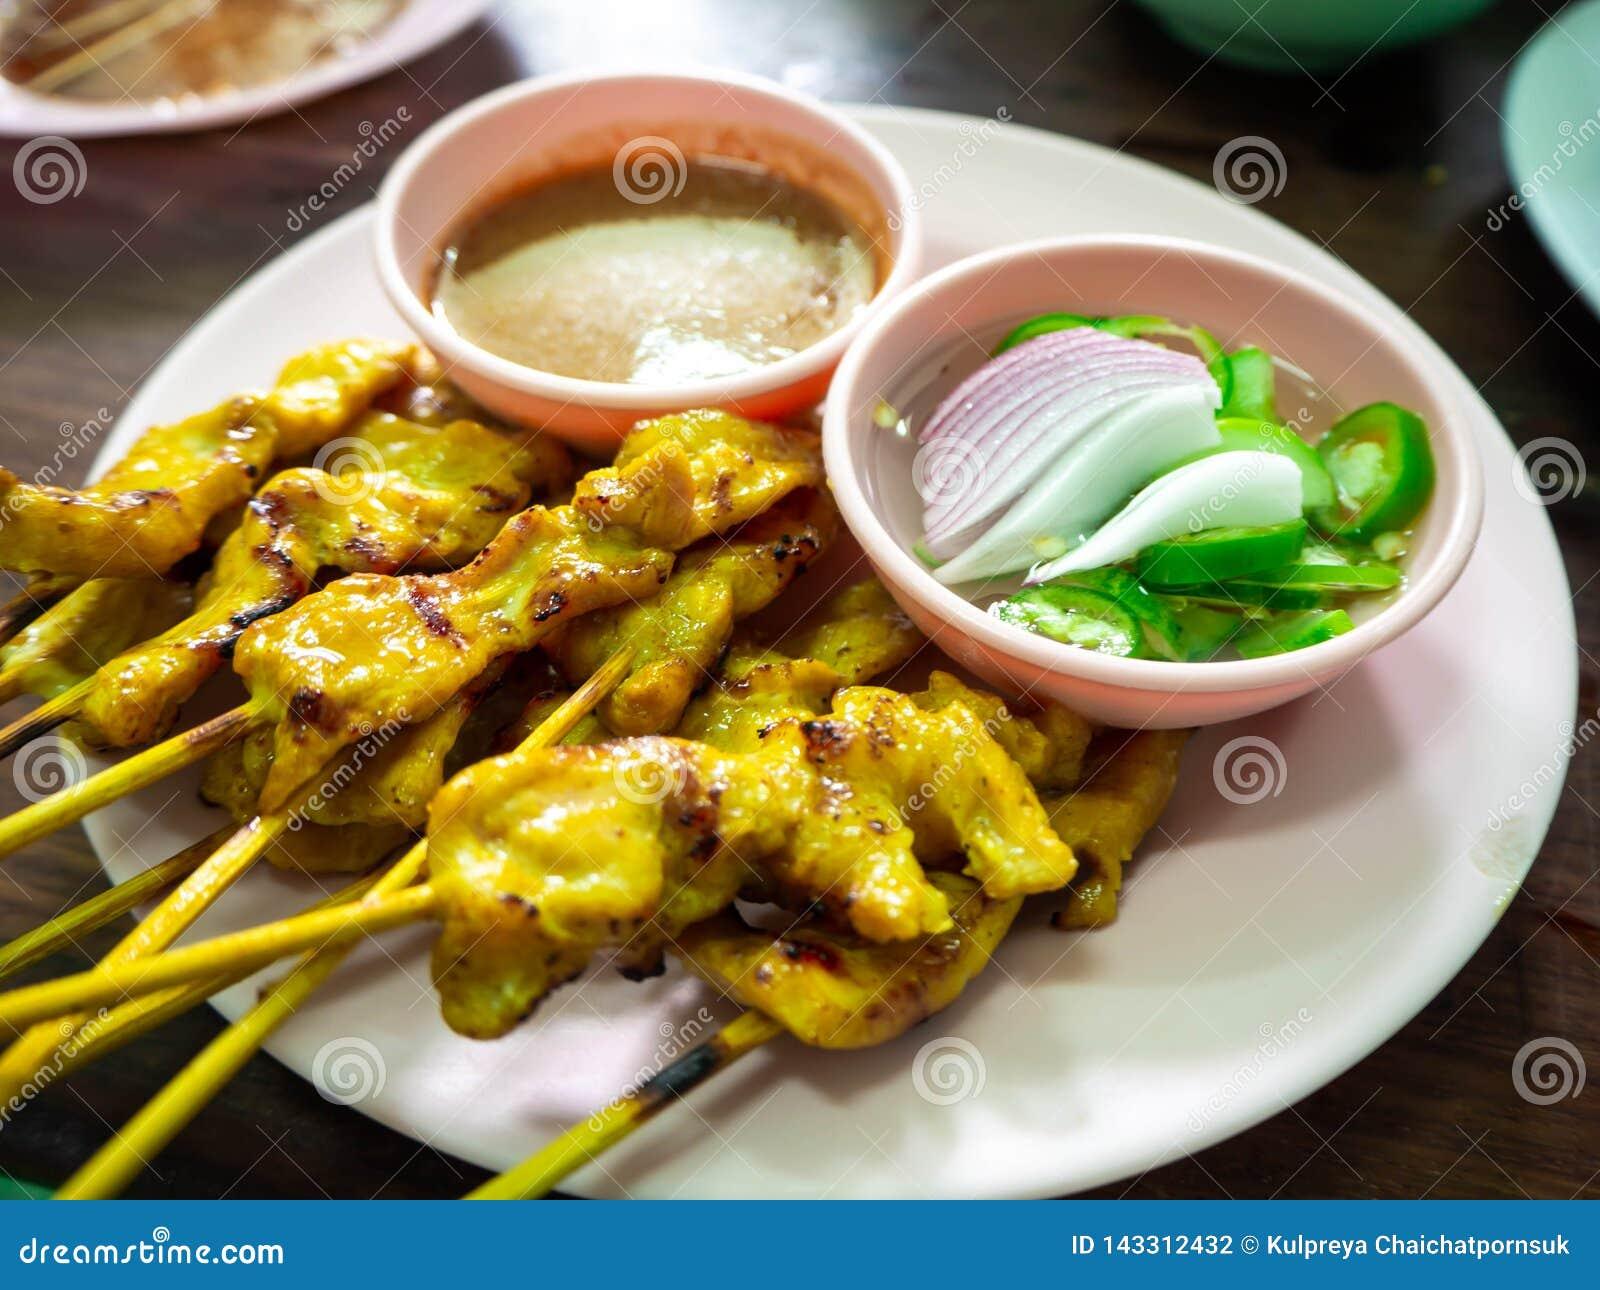 Pork Satay with peanut sauce, Thailand food